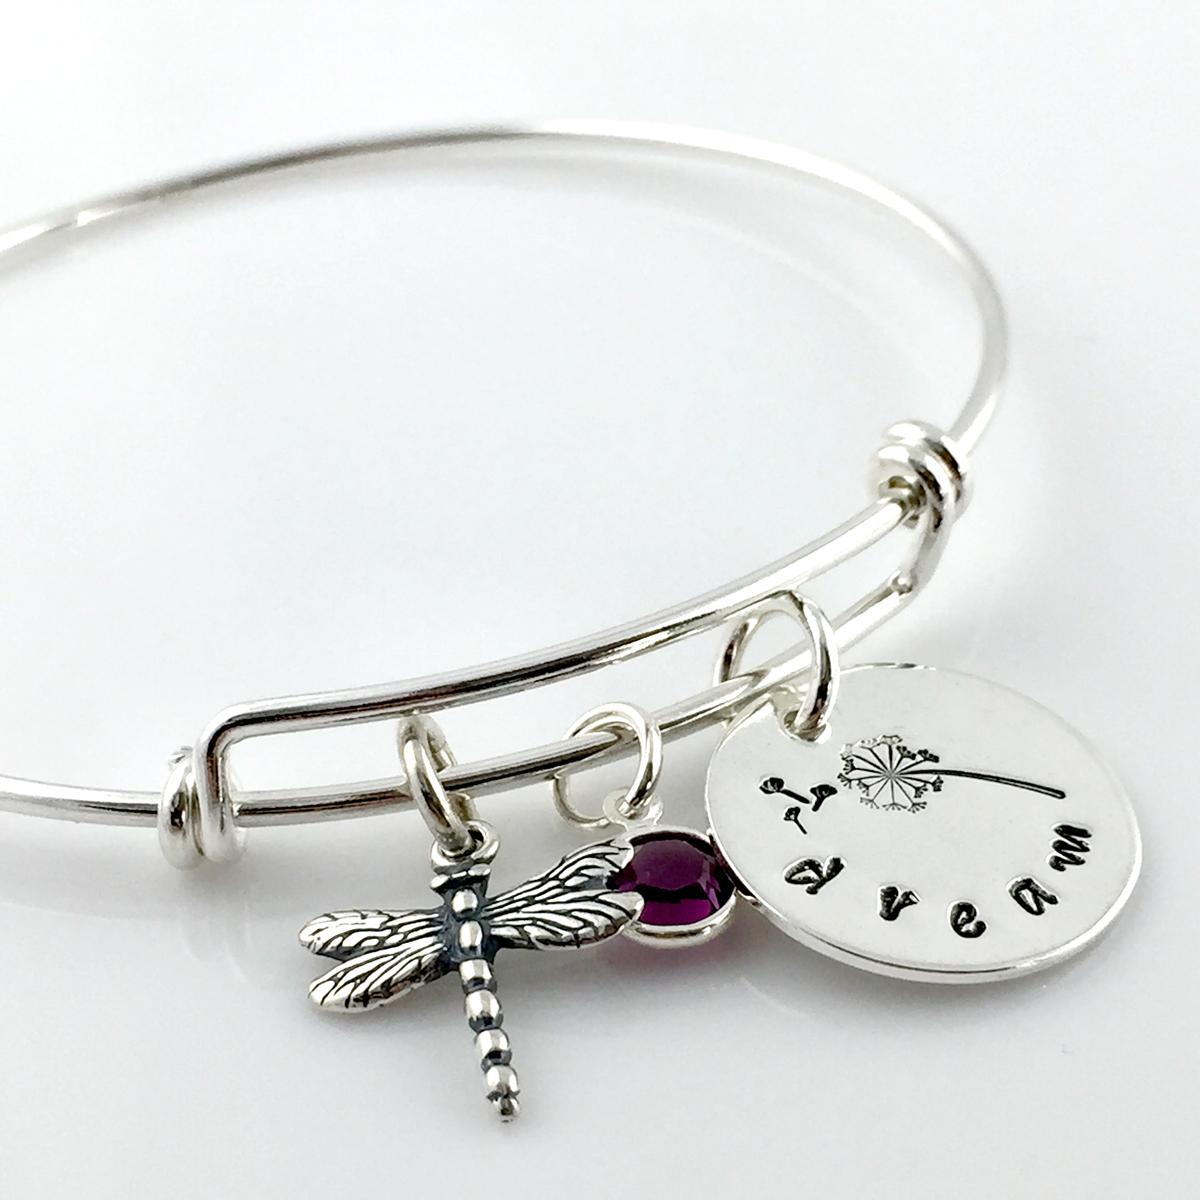 Dandelion Dream Simply Charming Bangle Bracelet